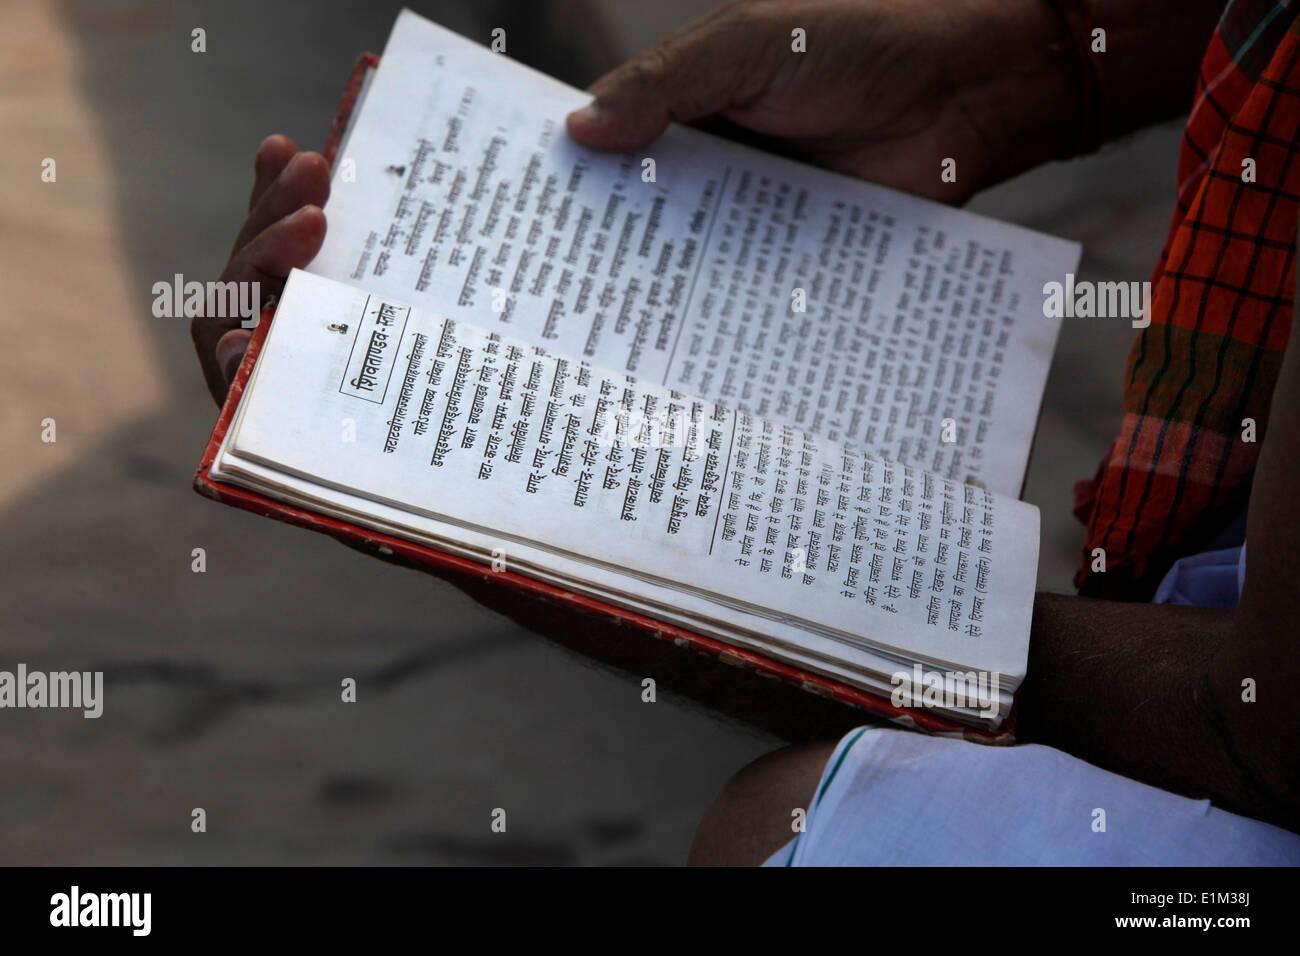 Hindu reading Shiva Chalisa, a prayer for Lord Shiva - Stock Image